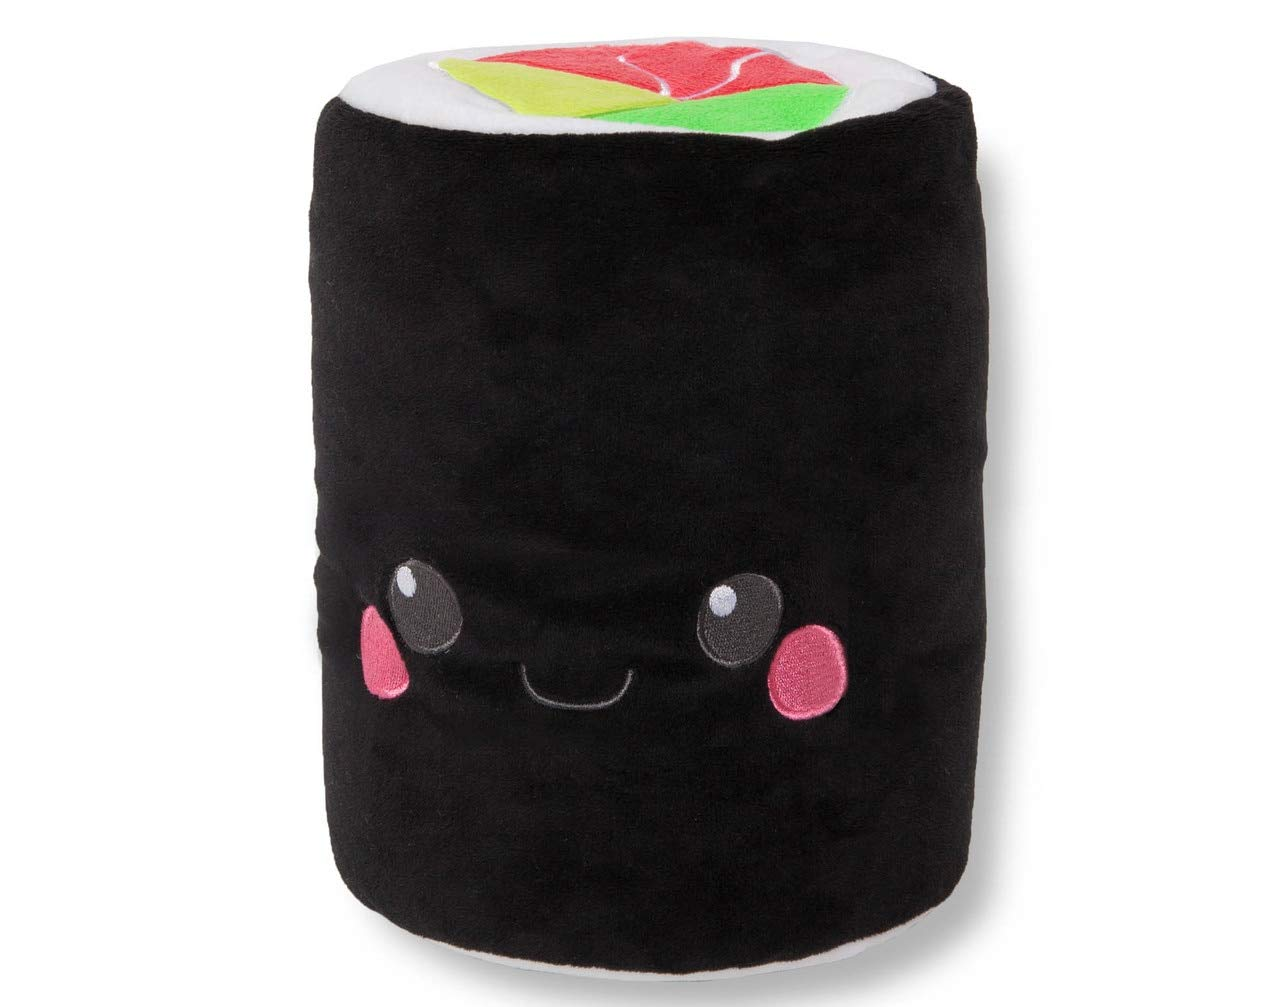 QE Home Convertible U-Shaped Travel Neck Pillow Sushi Black